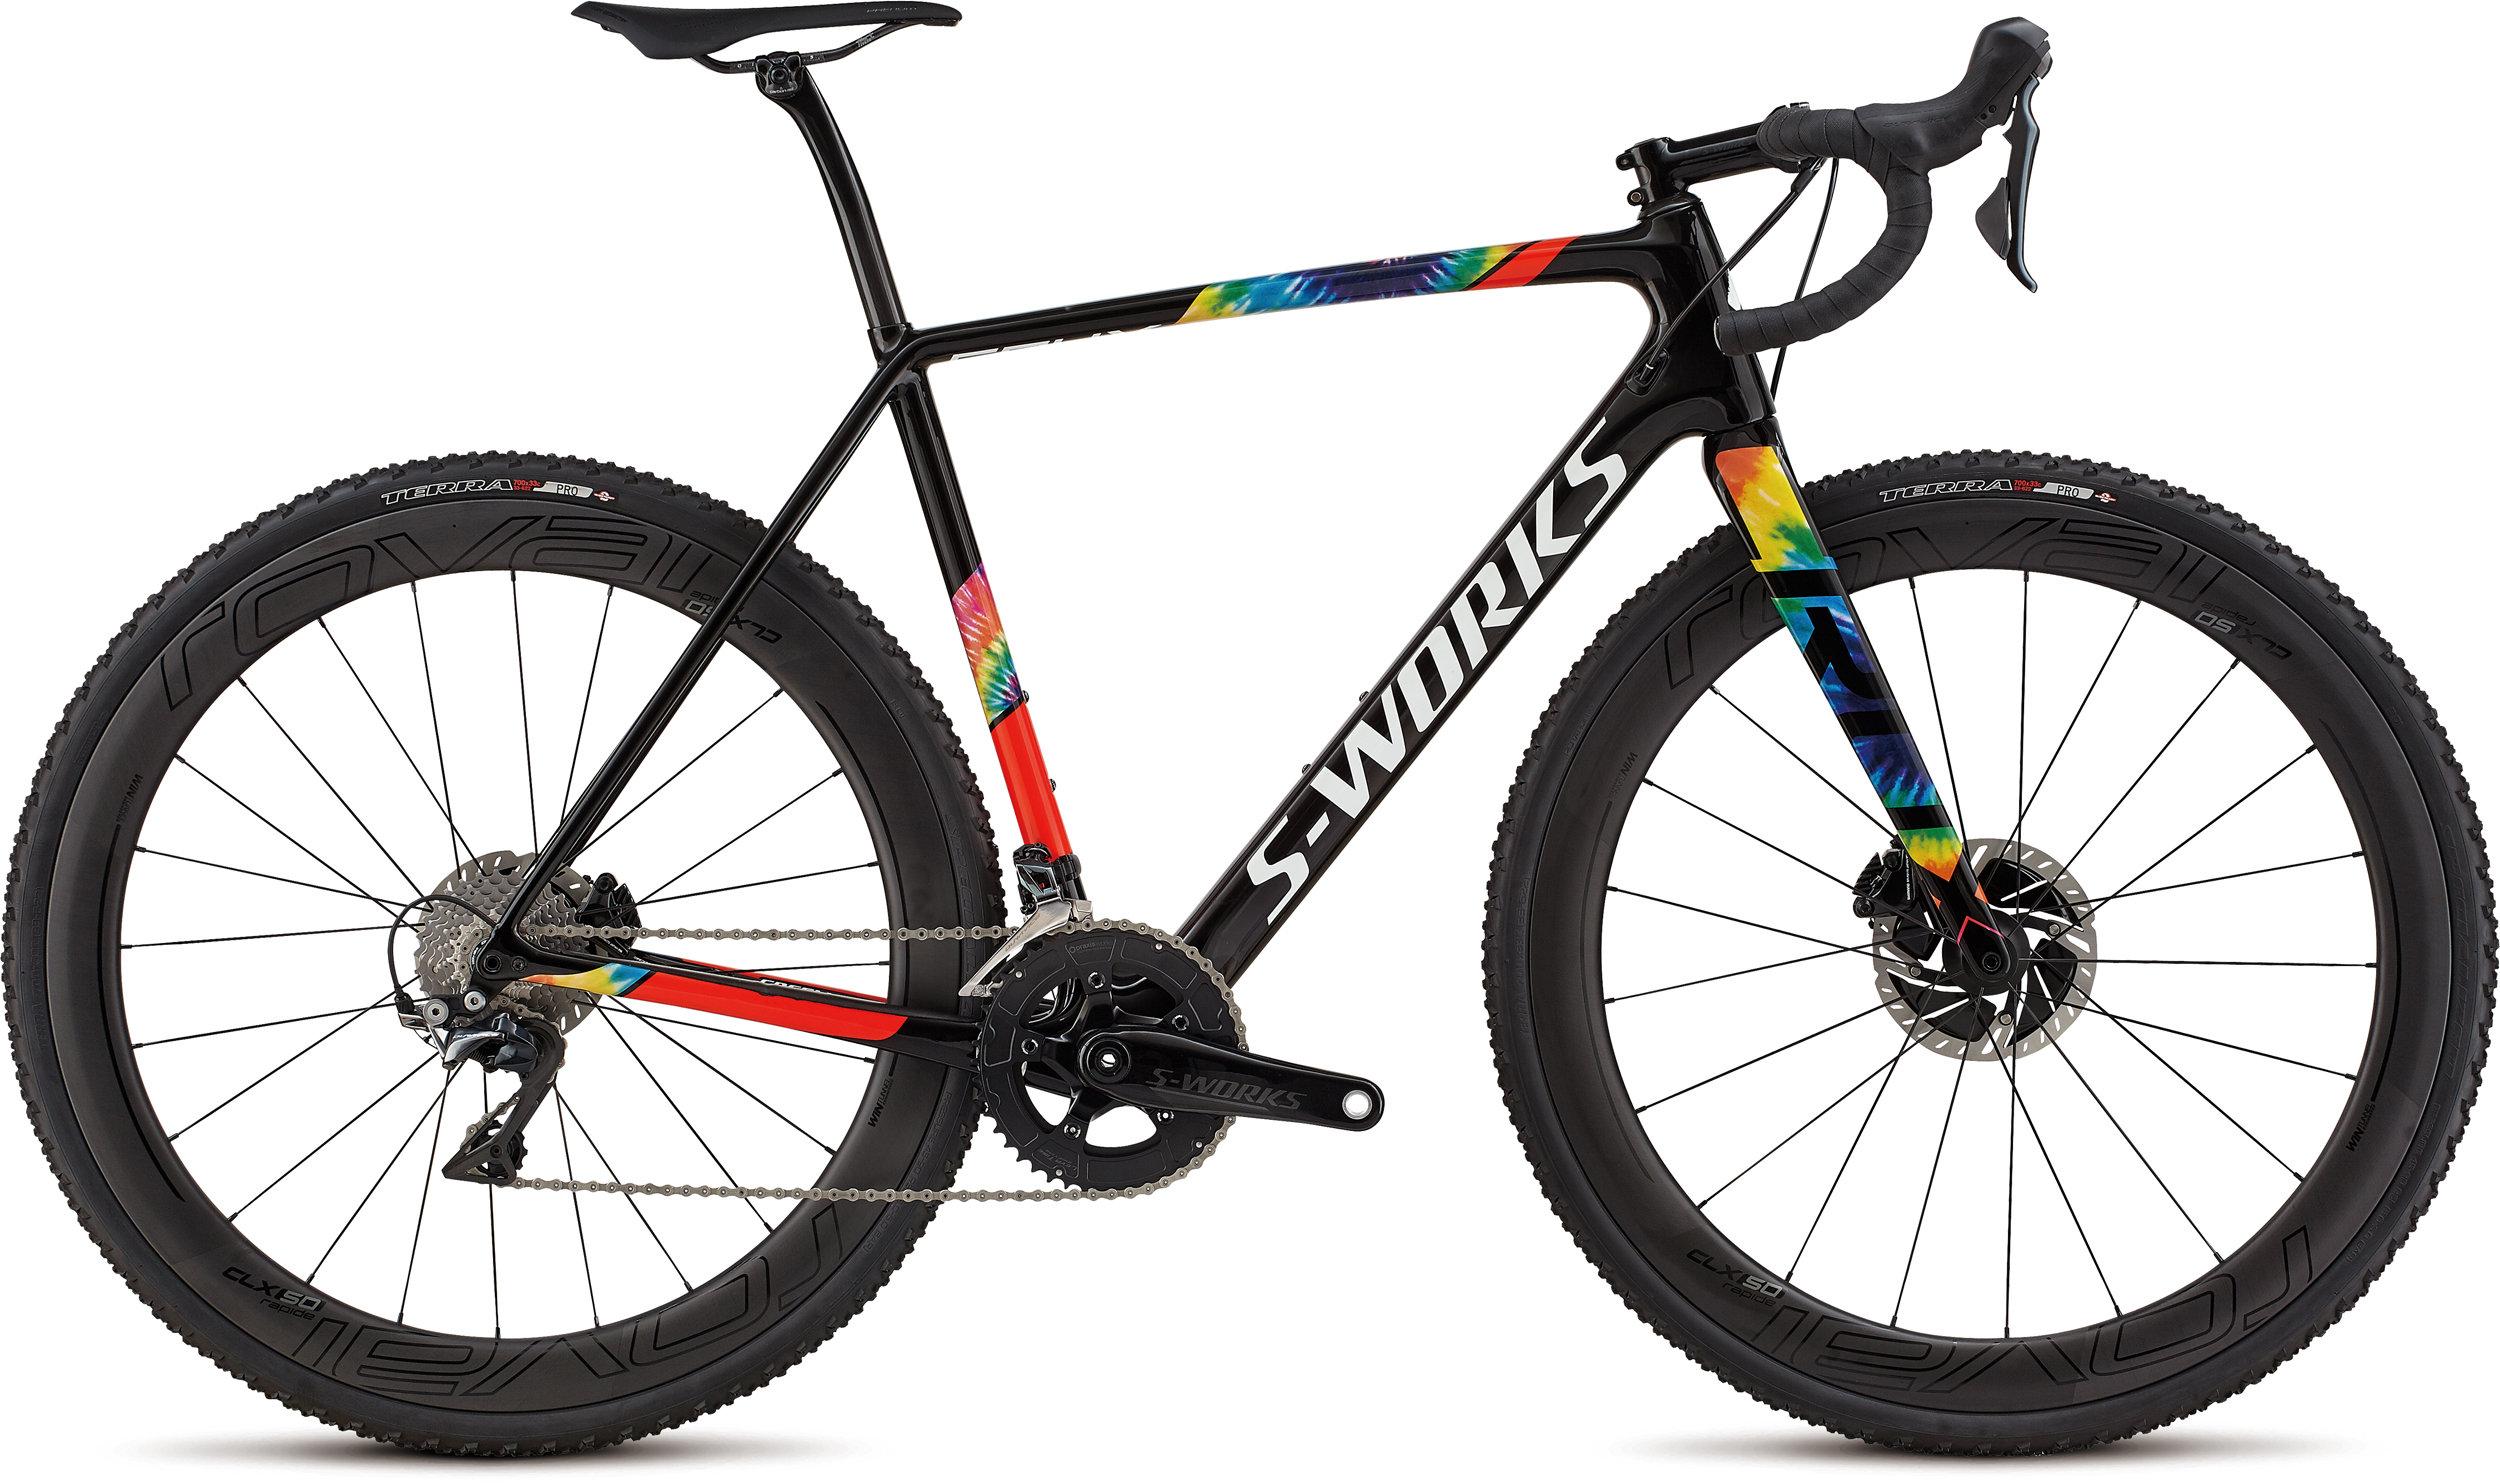 Specialized S-Works CruX Gloss SL Blk/Cosmos/Rkt Red/ Wht Hph Clear 49 - Bike Maniac